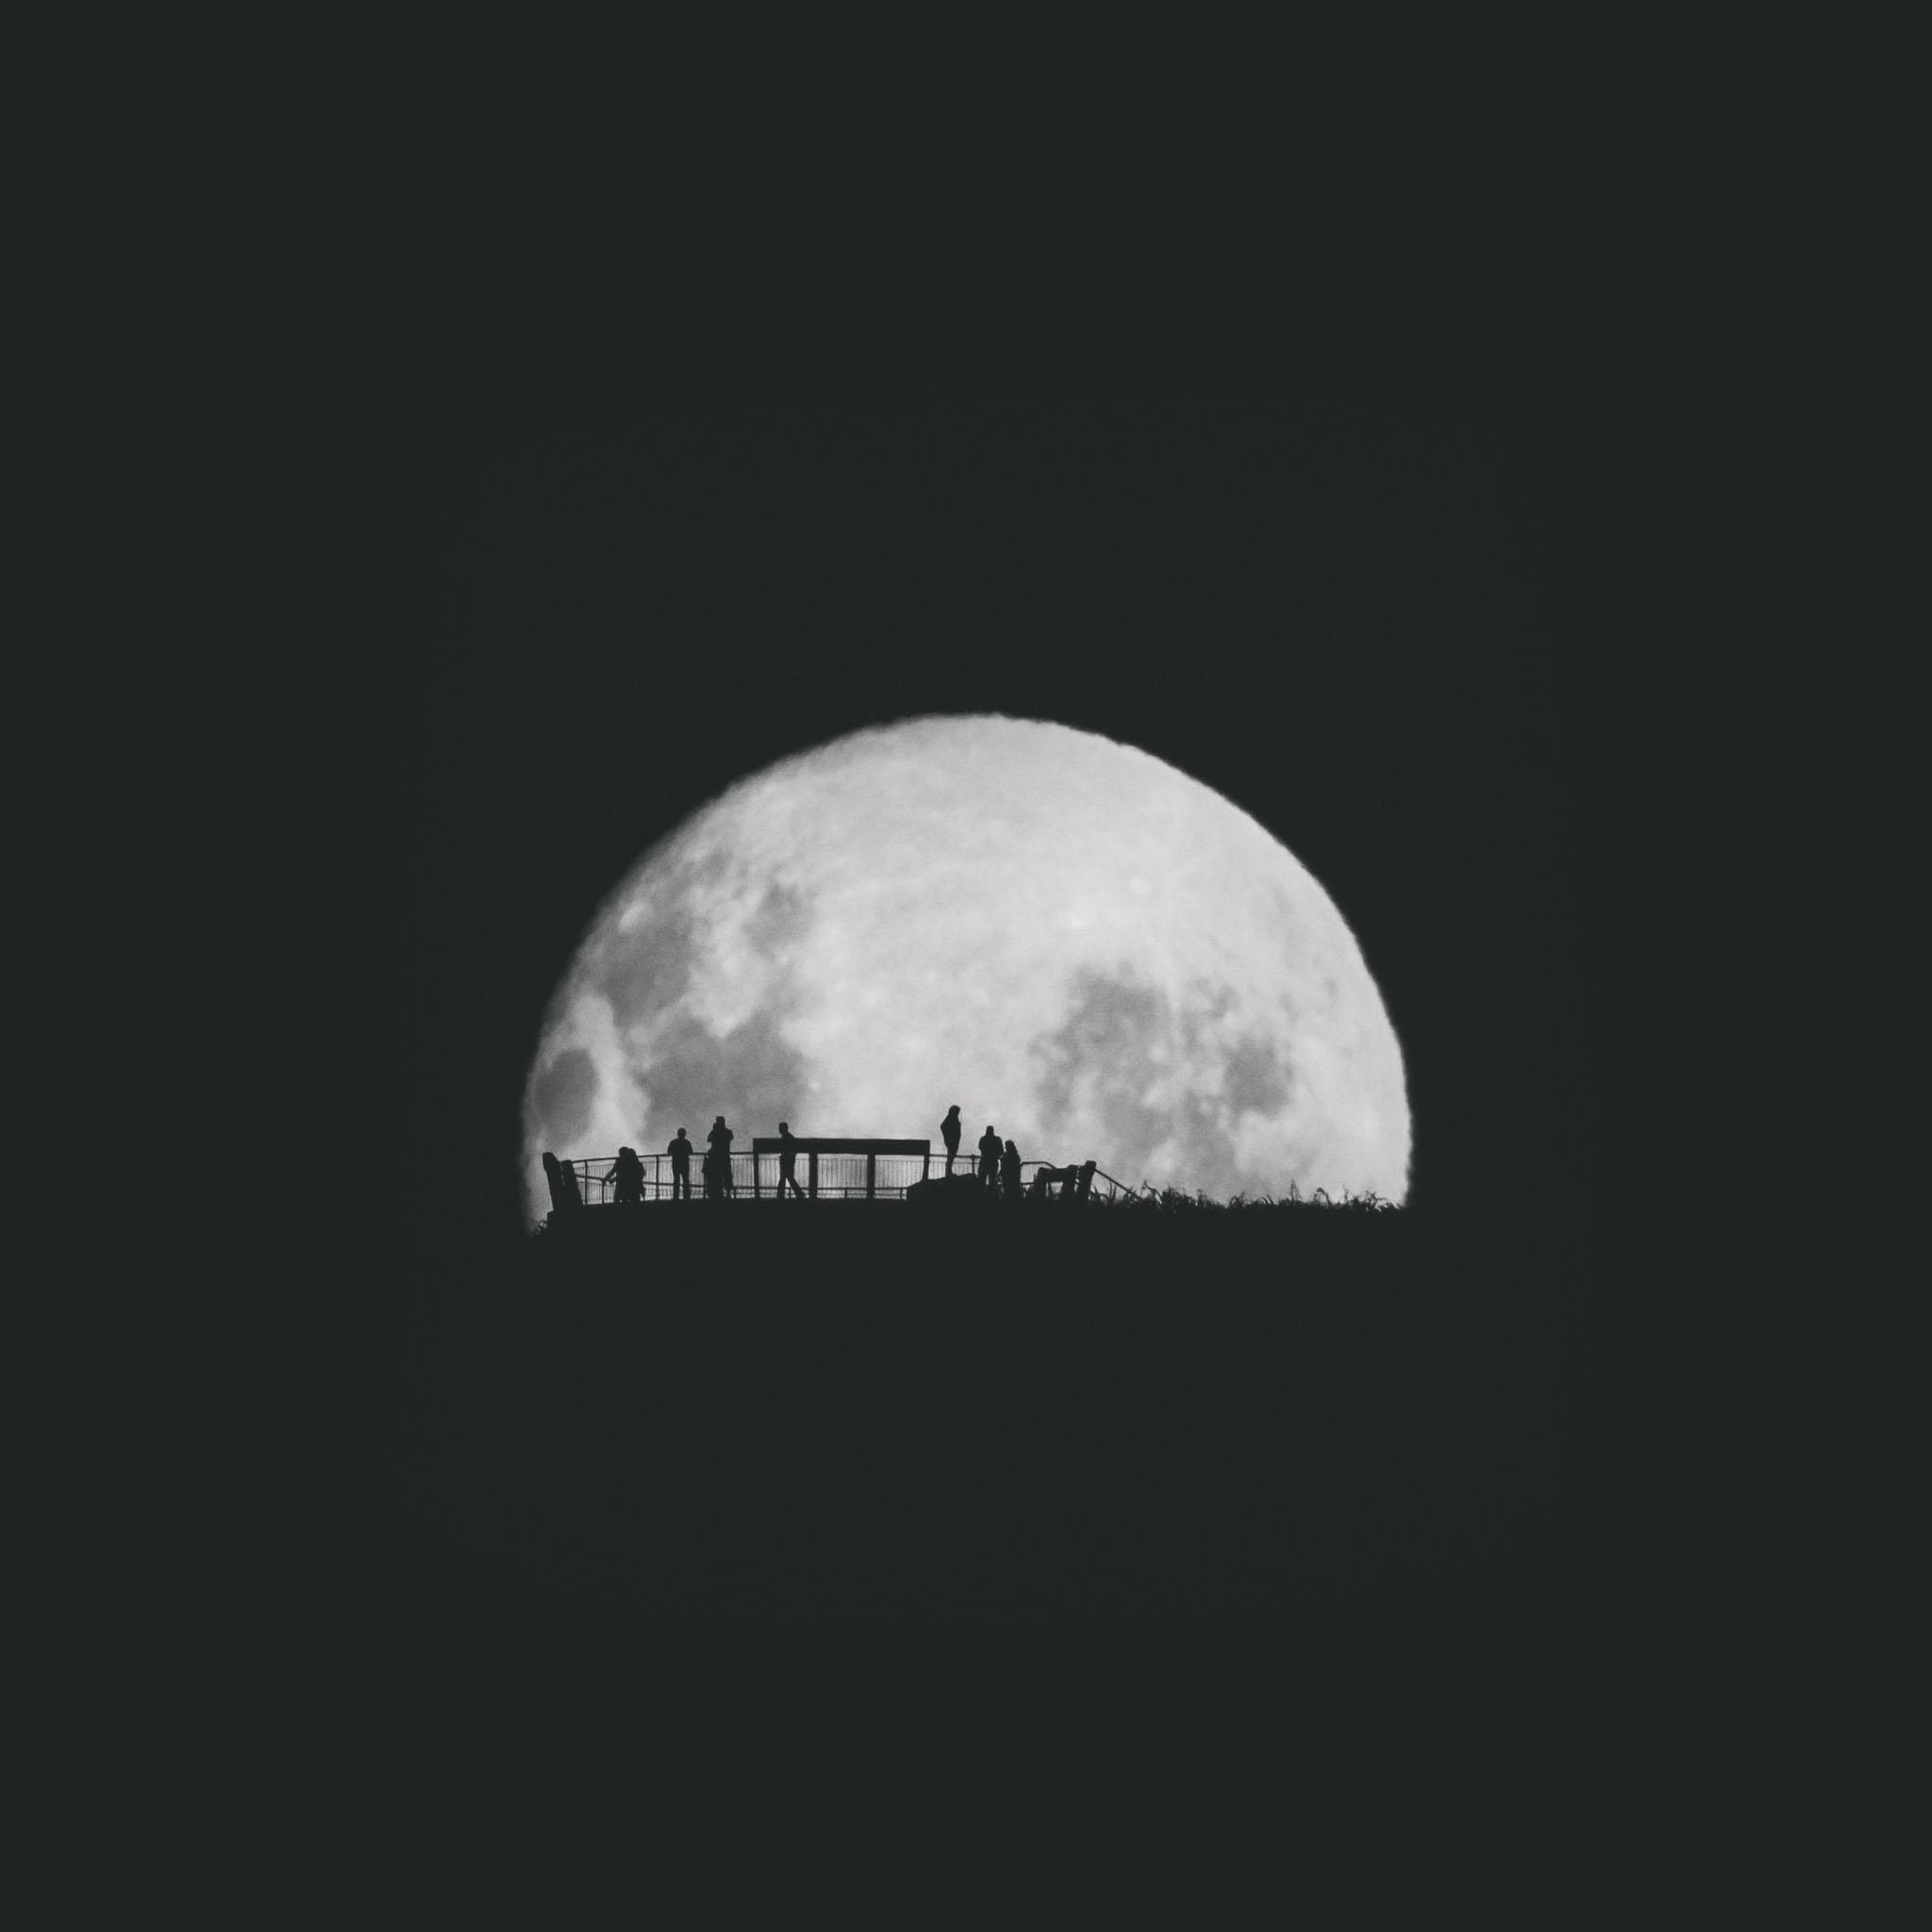 Wallpaper iphone moon - Freeios7 Moon Silhouettes 2 Parallax Hd Iphone Ipad Wallpaper